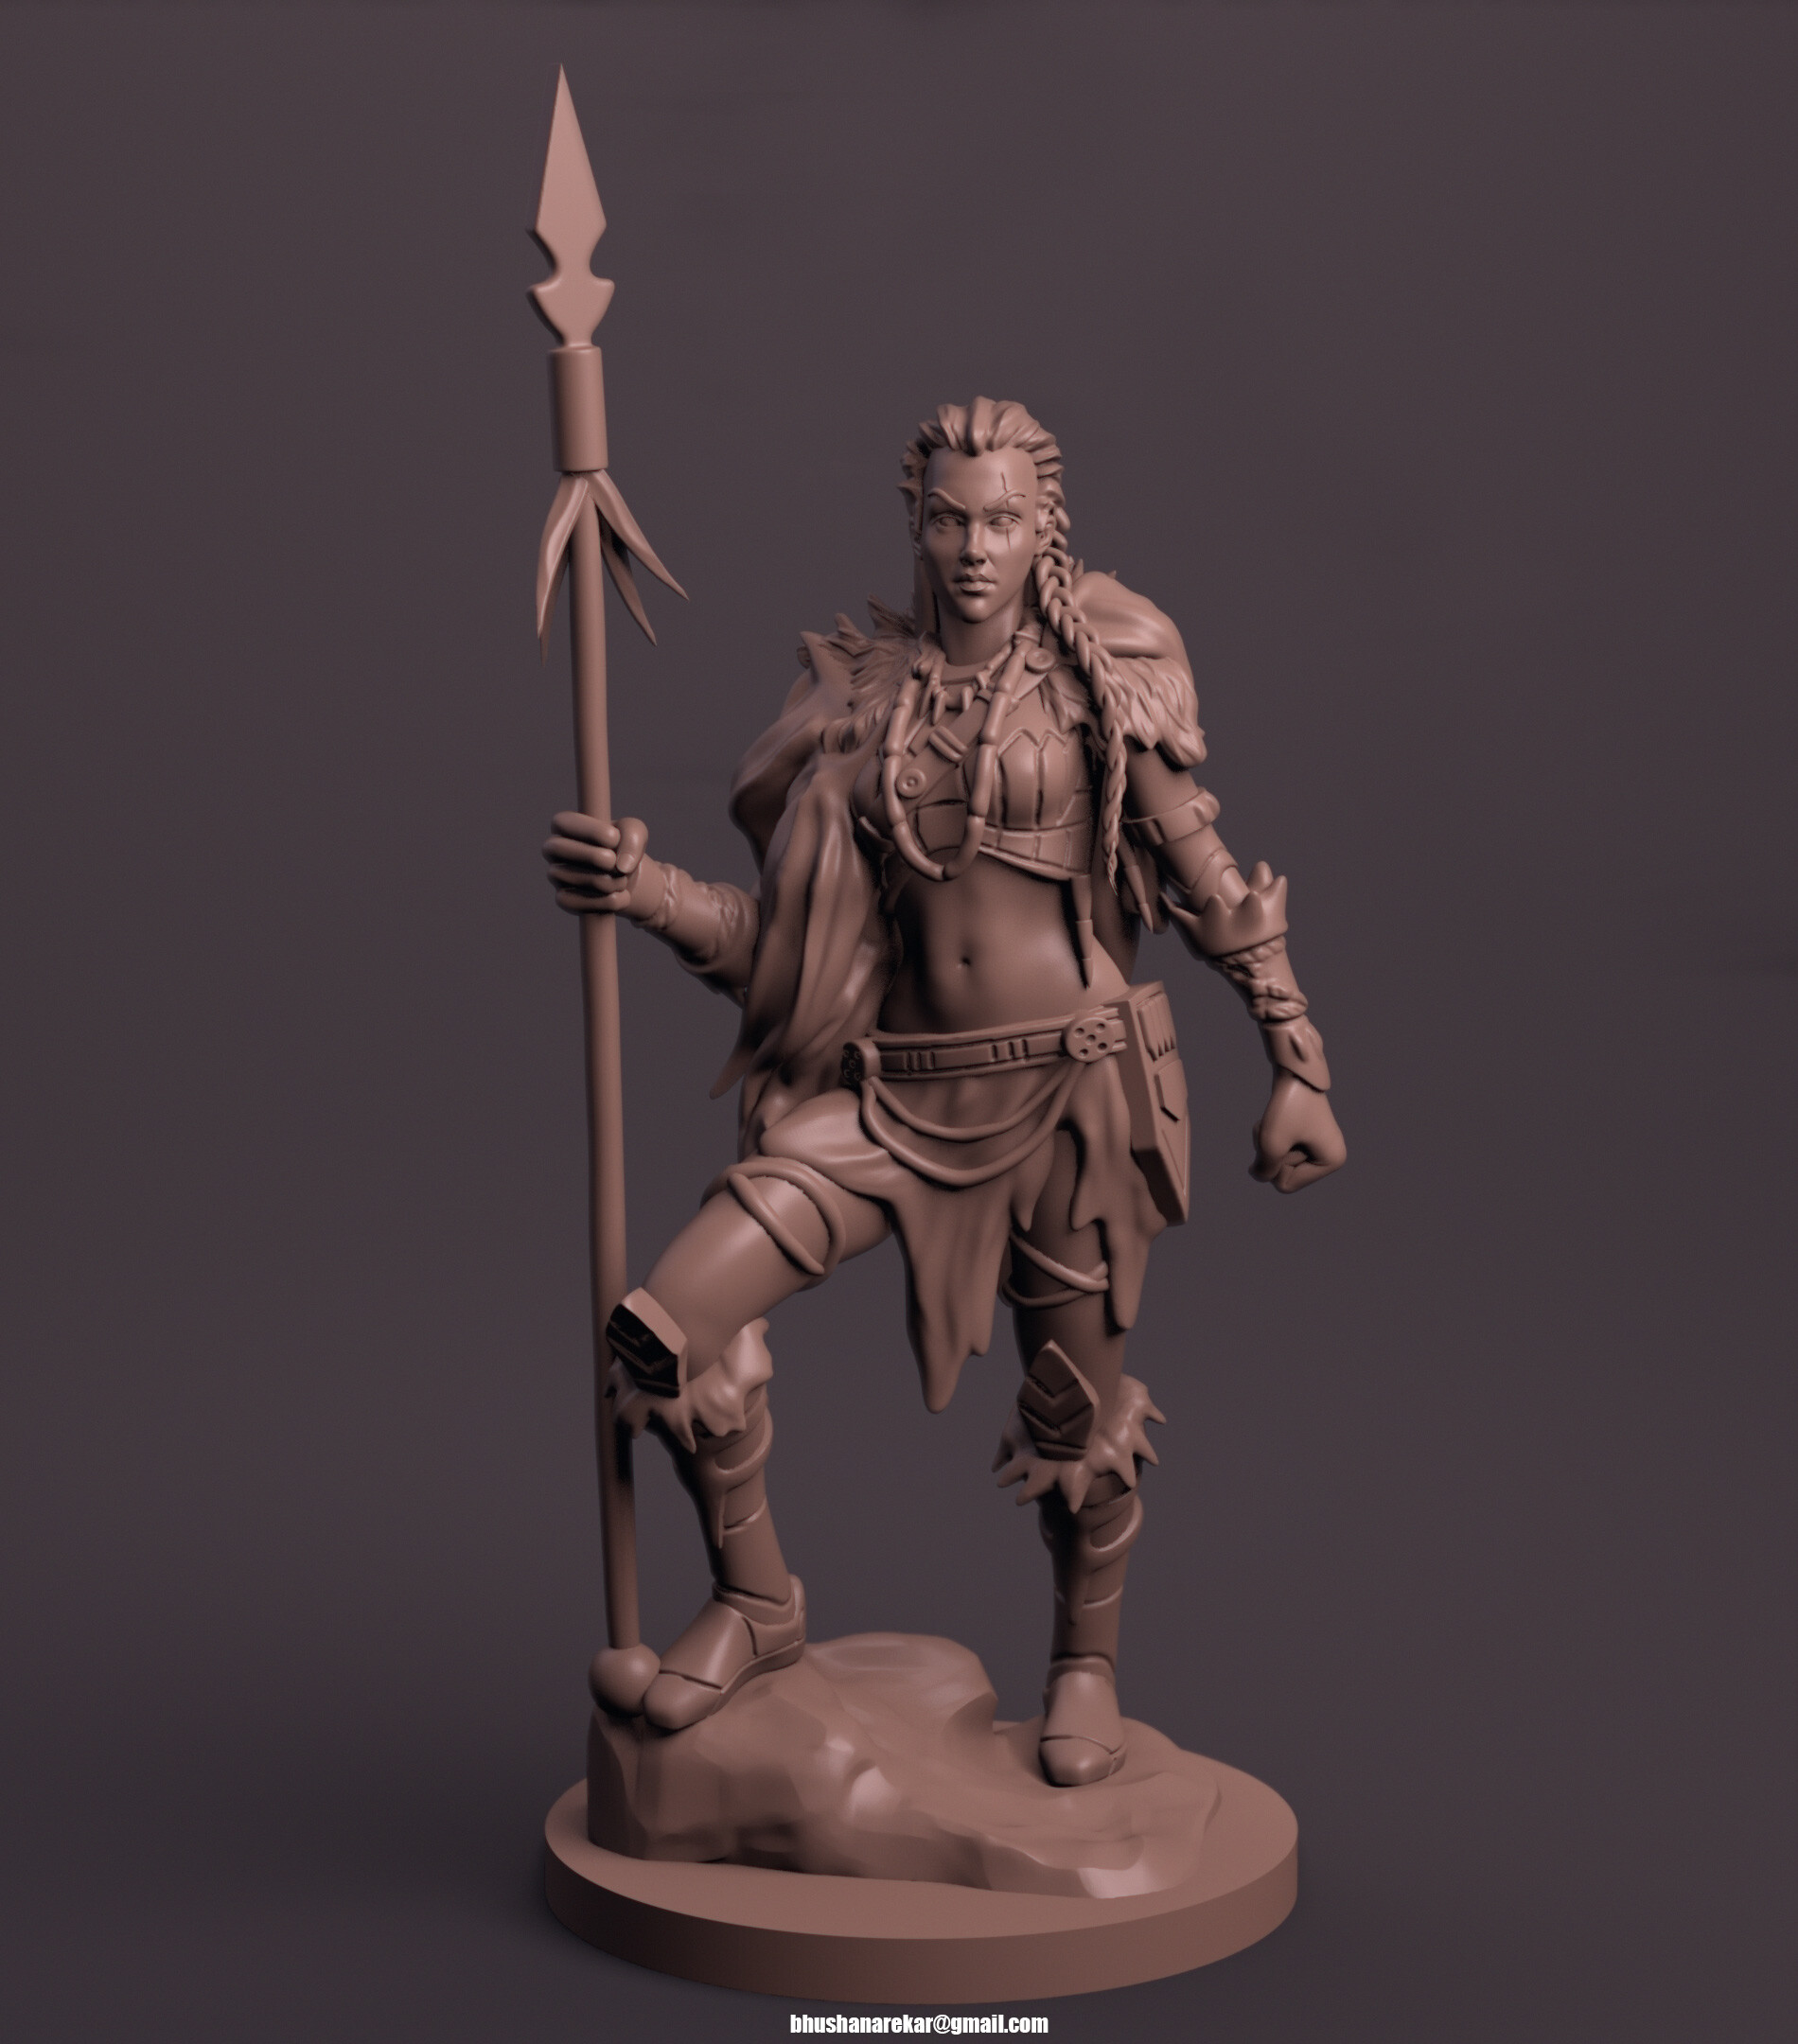 Bhushan arekar amazon warrior